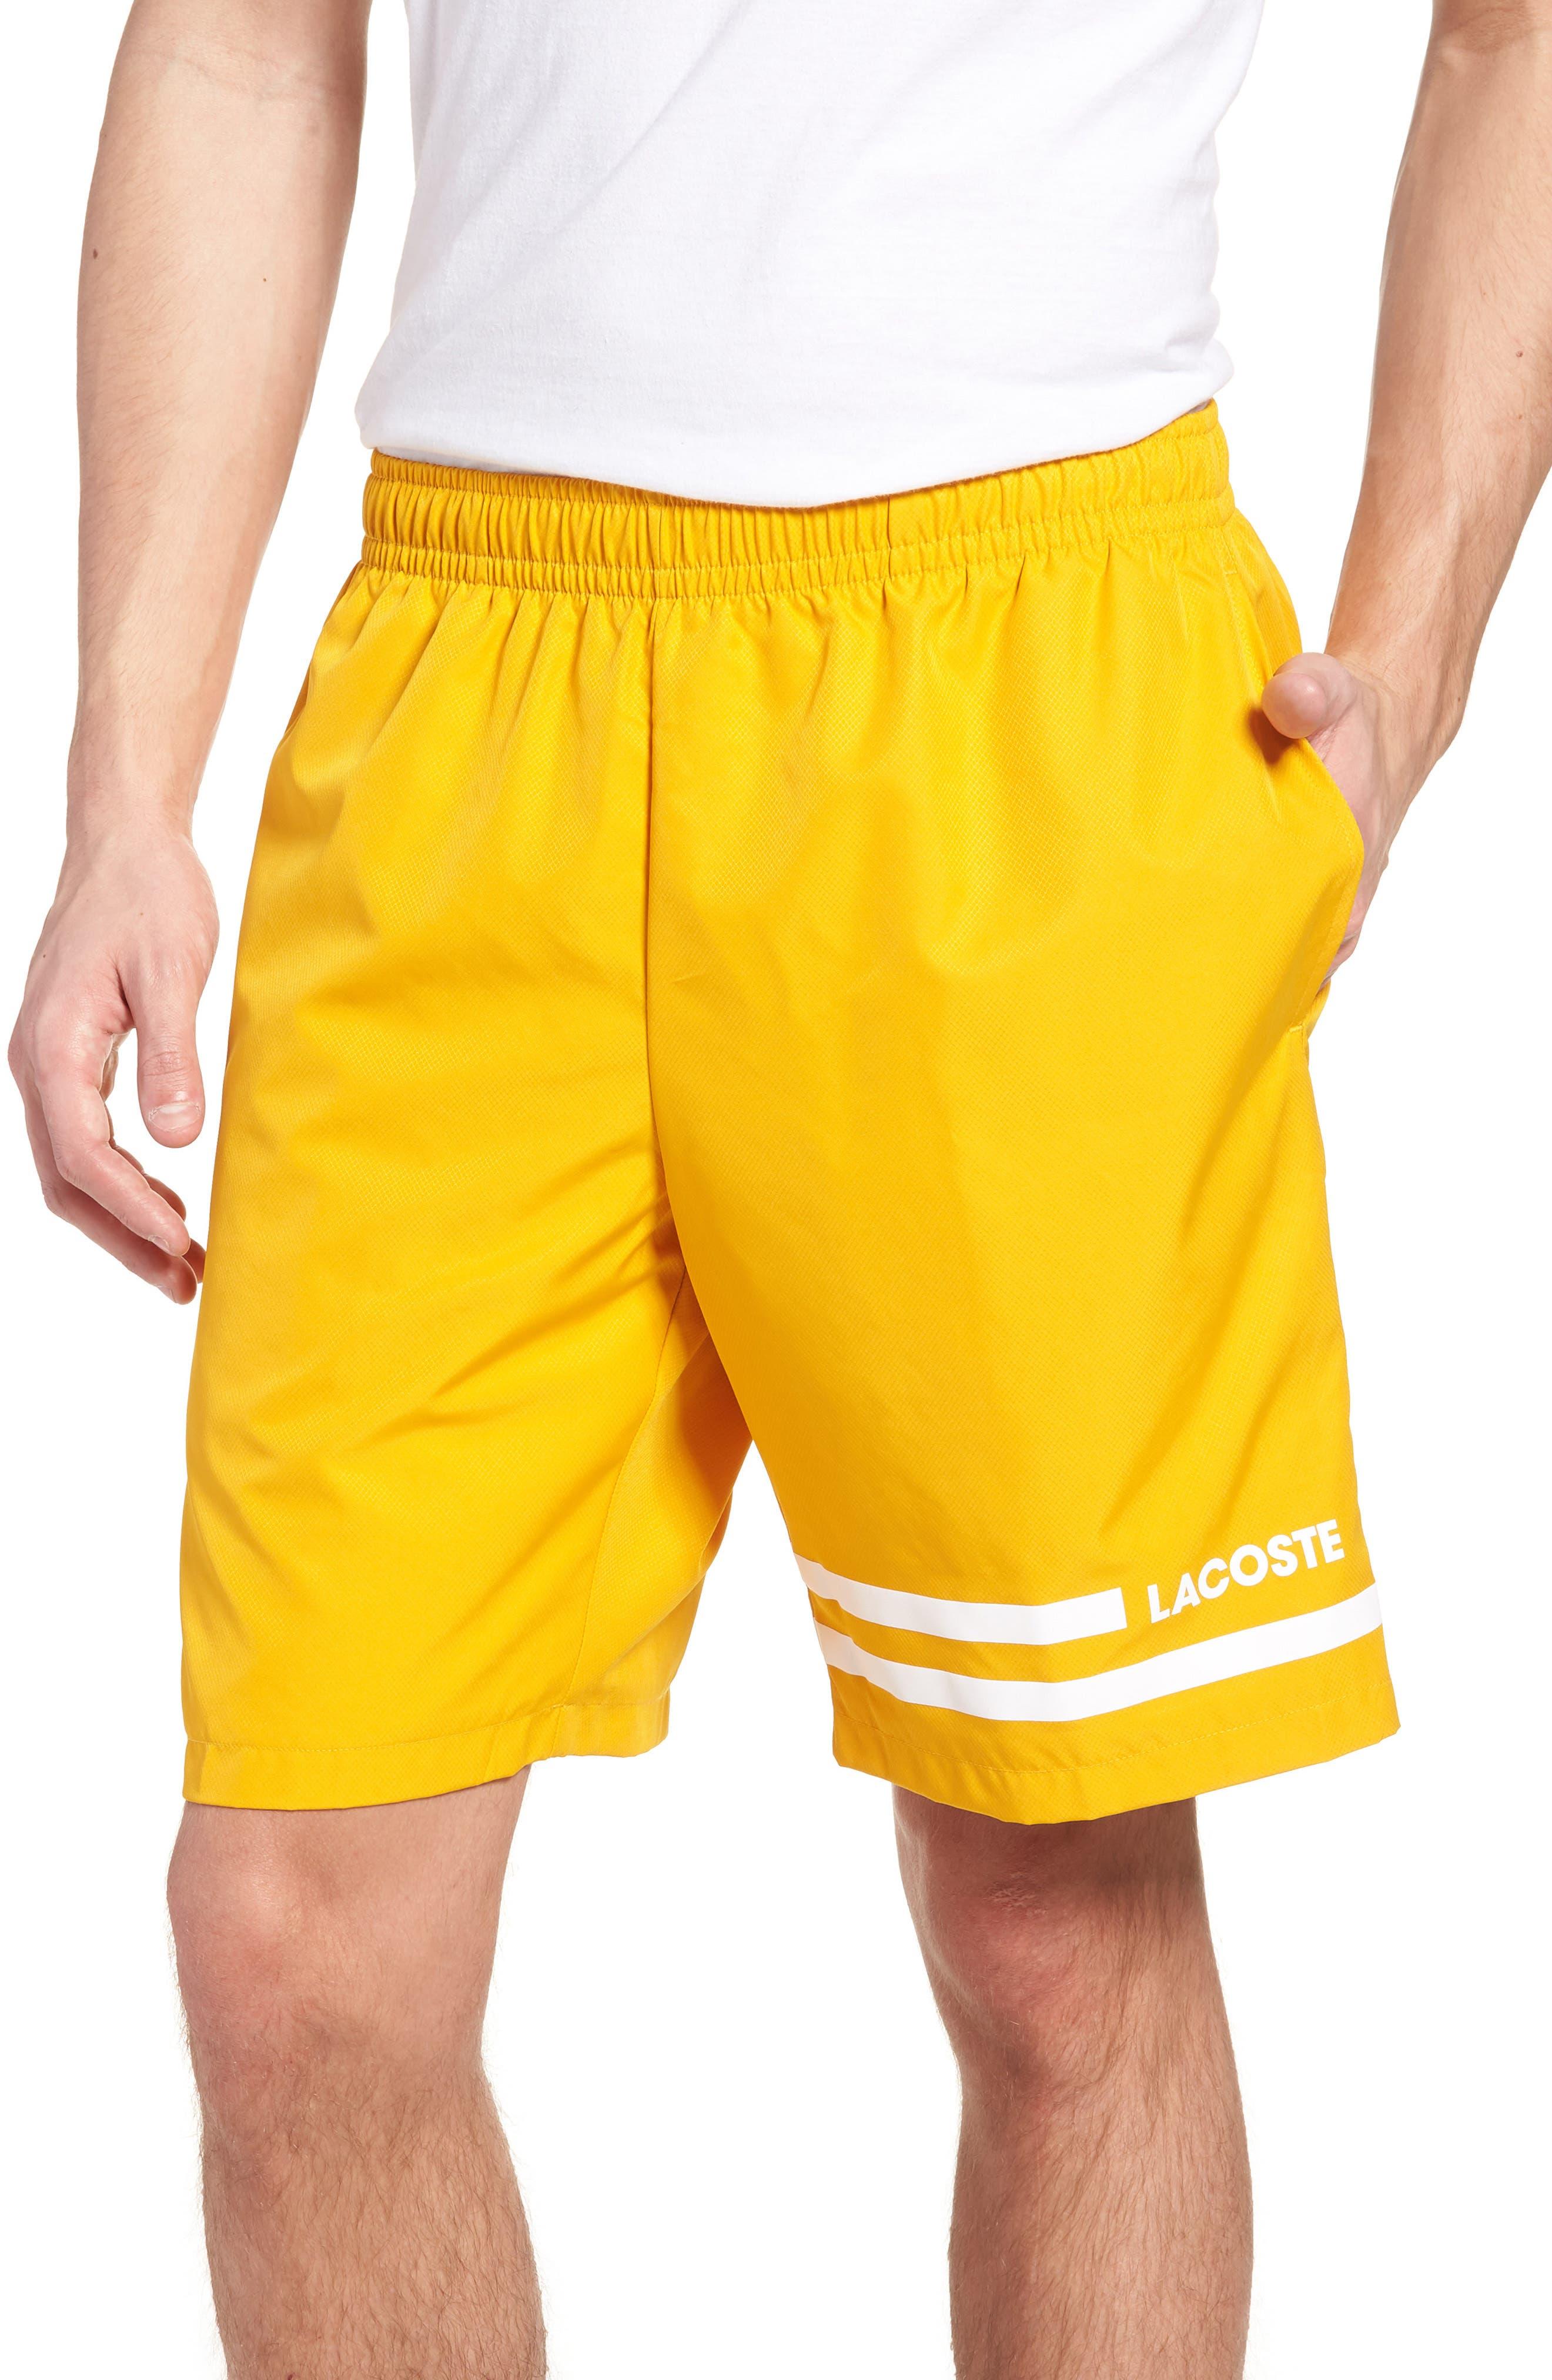 Stripe Shorts,                             Main thumbnail 1, color,                             Buttercup/ White